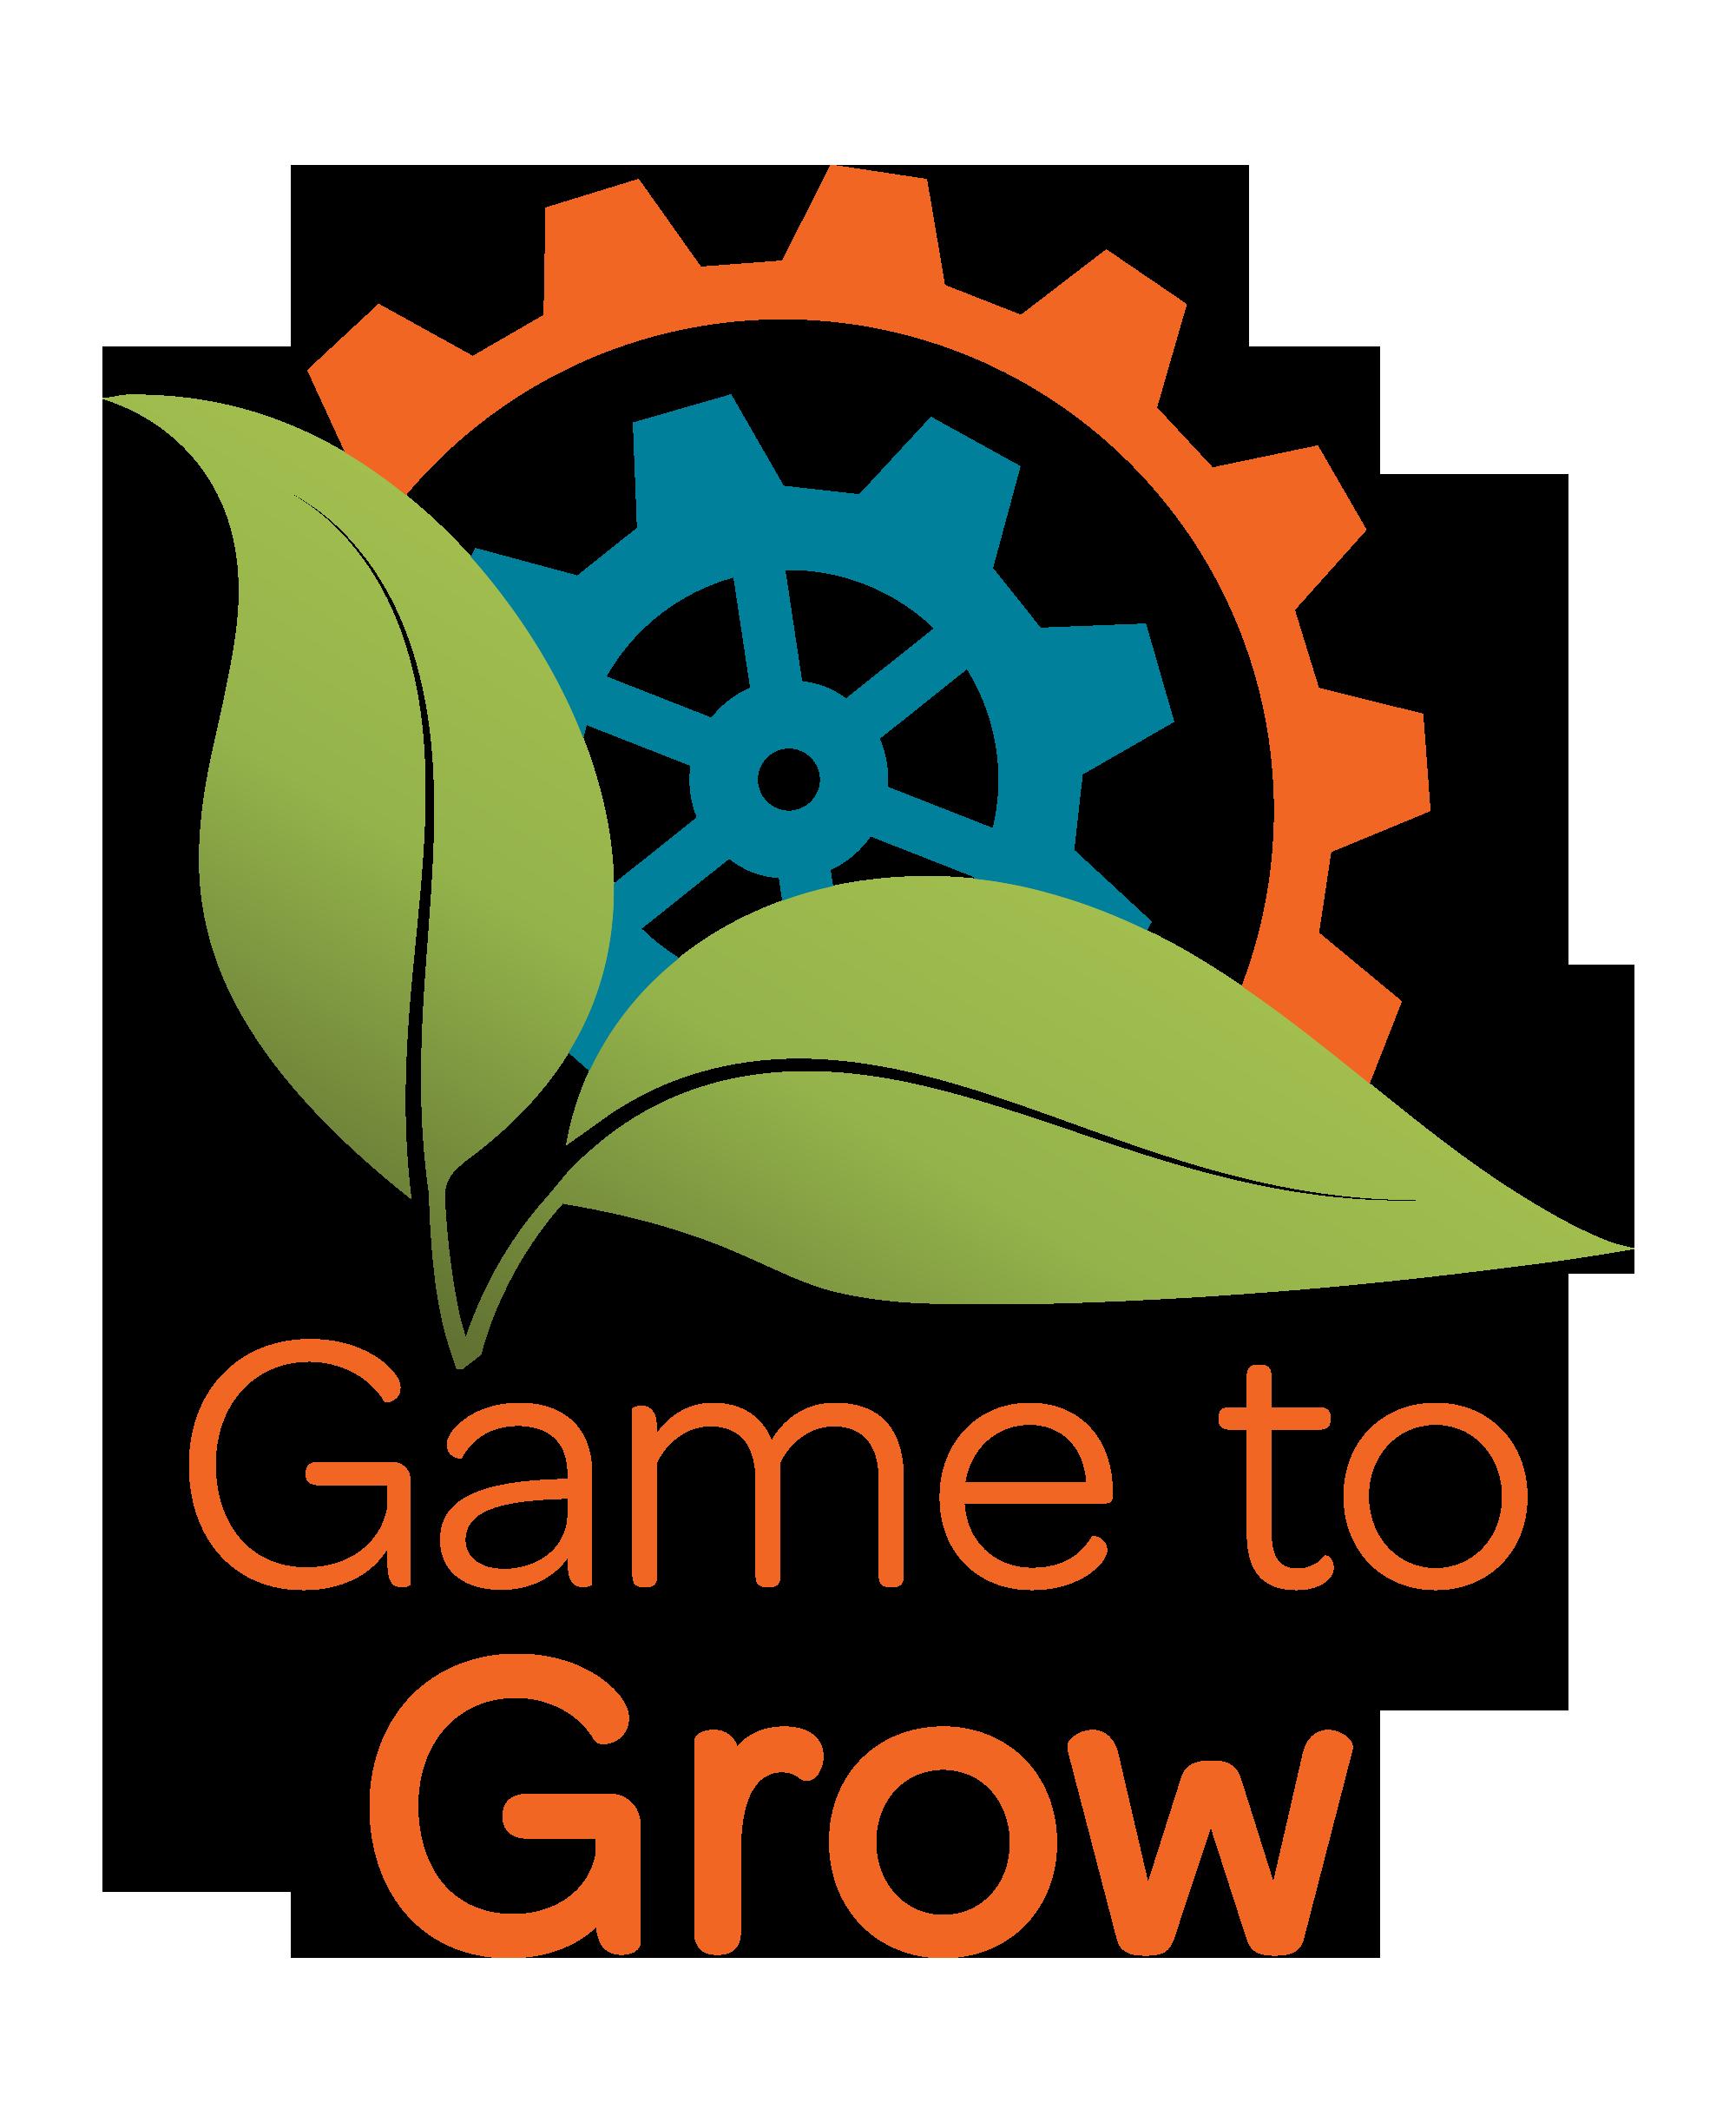 Game to Grow